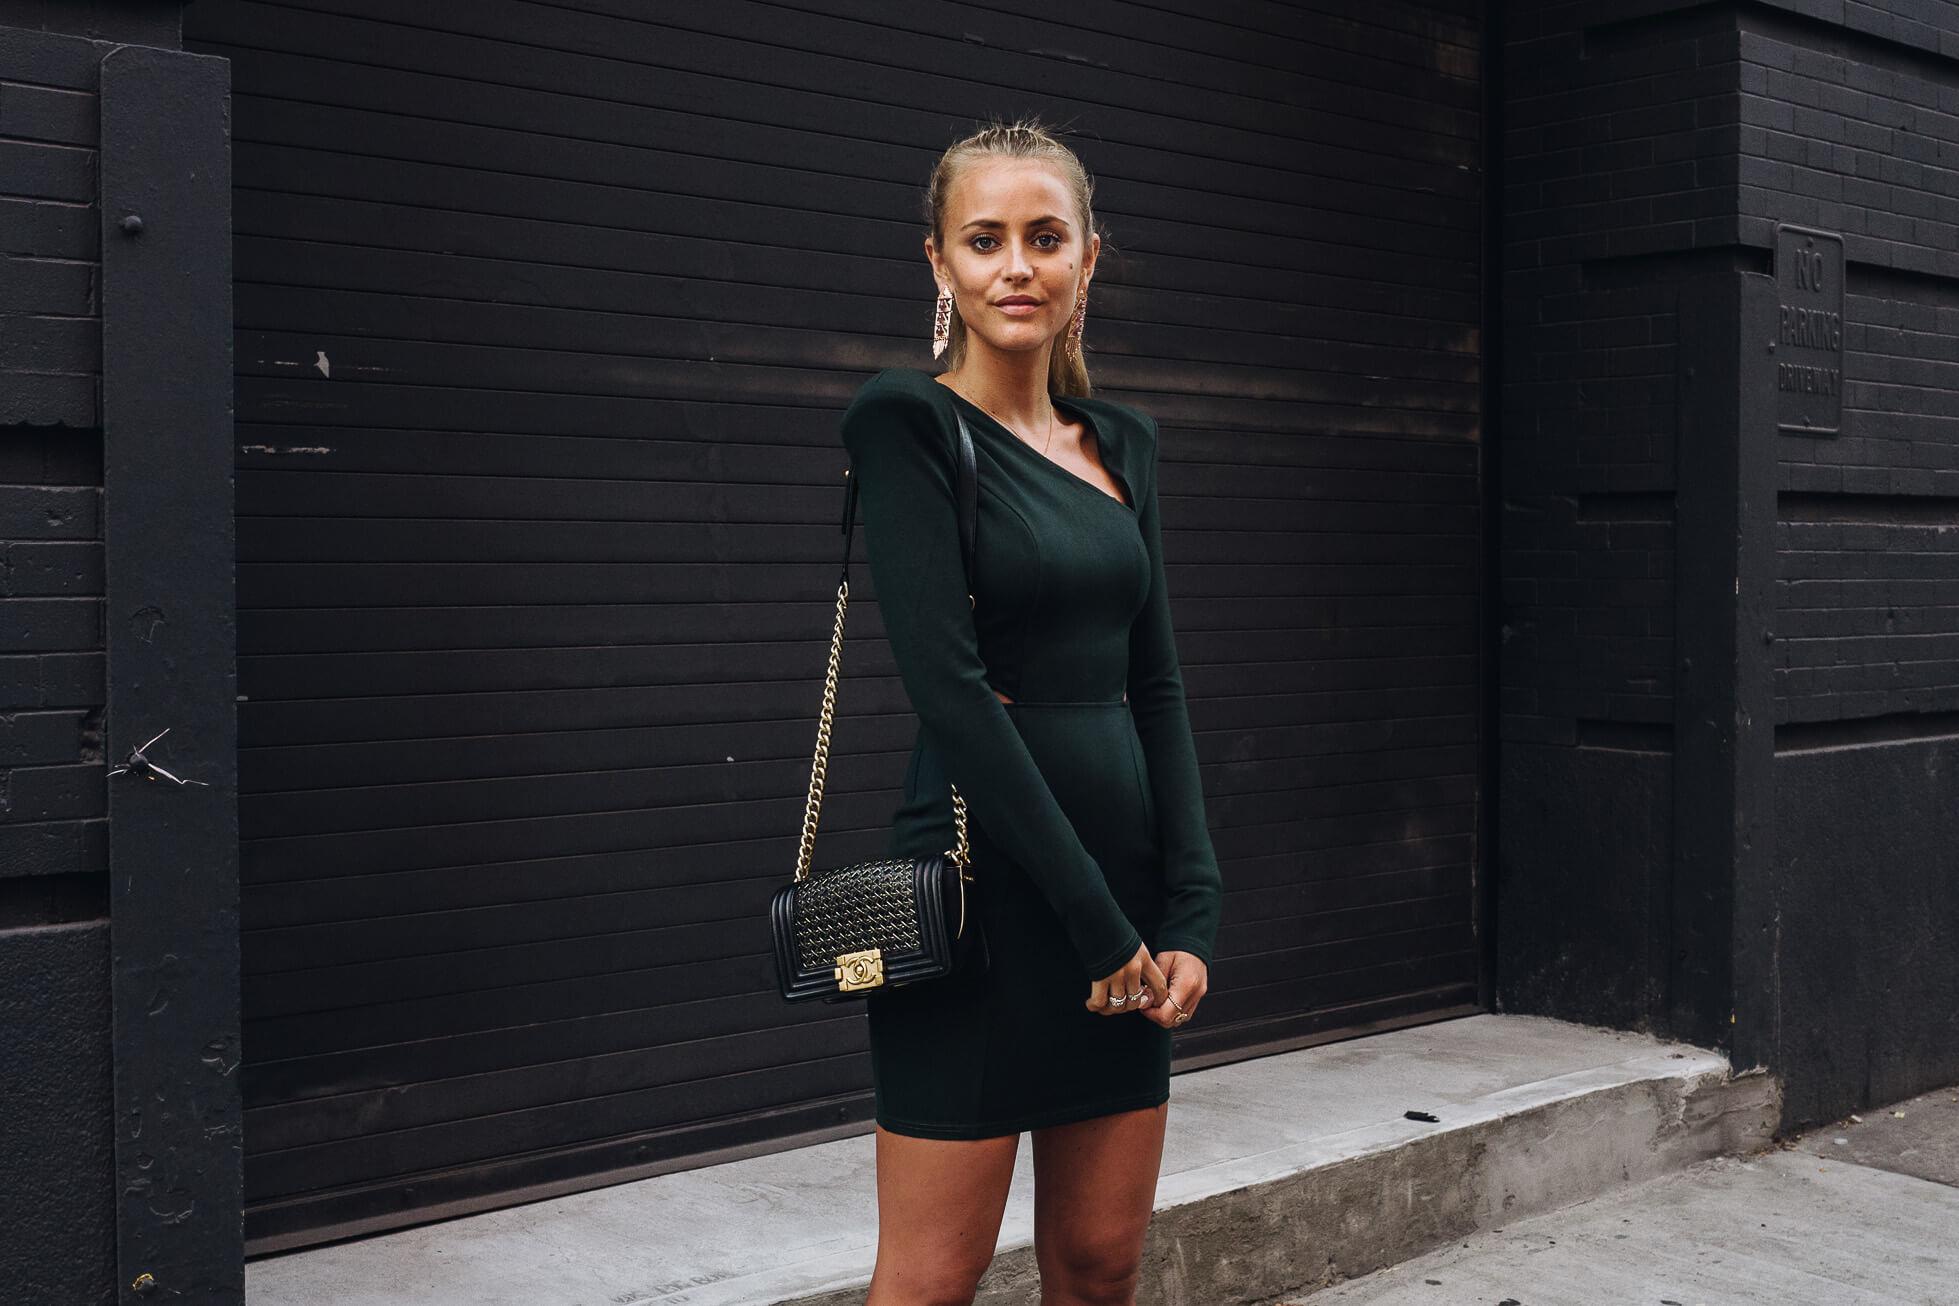 janni-deler-green-dressL1090630-Redigera